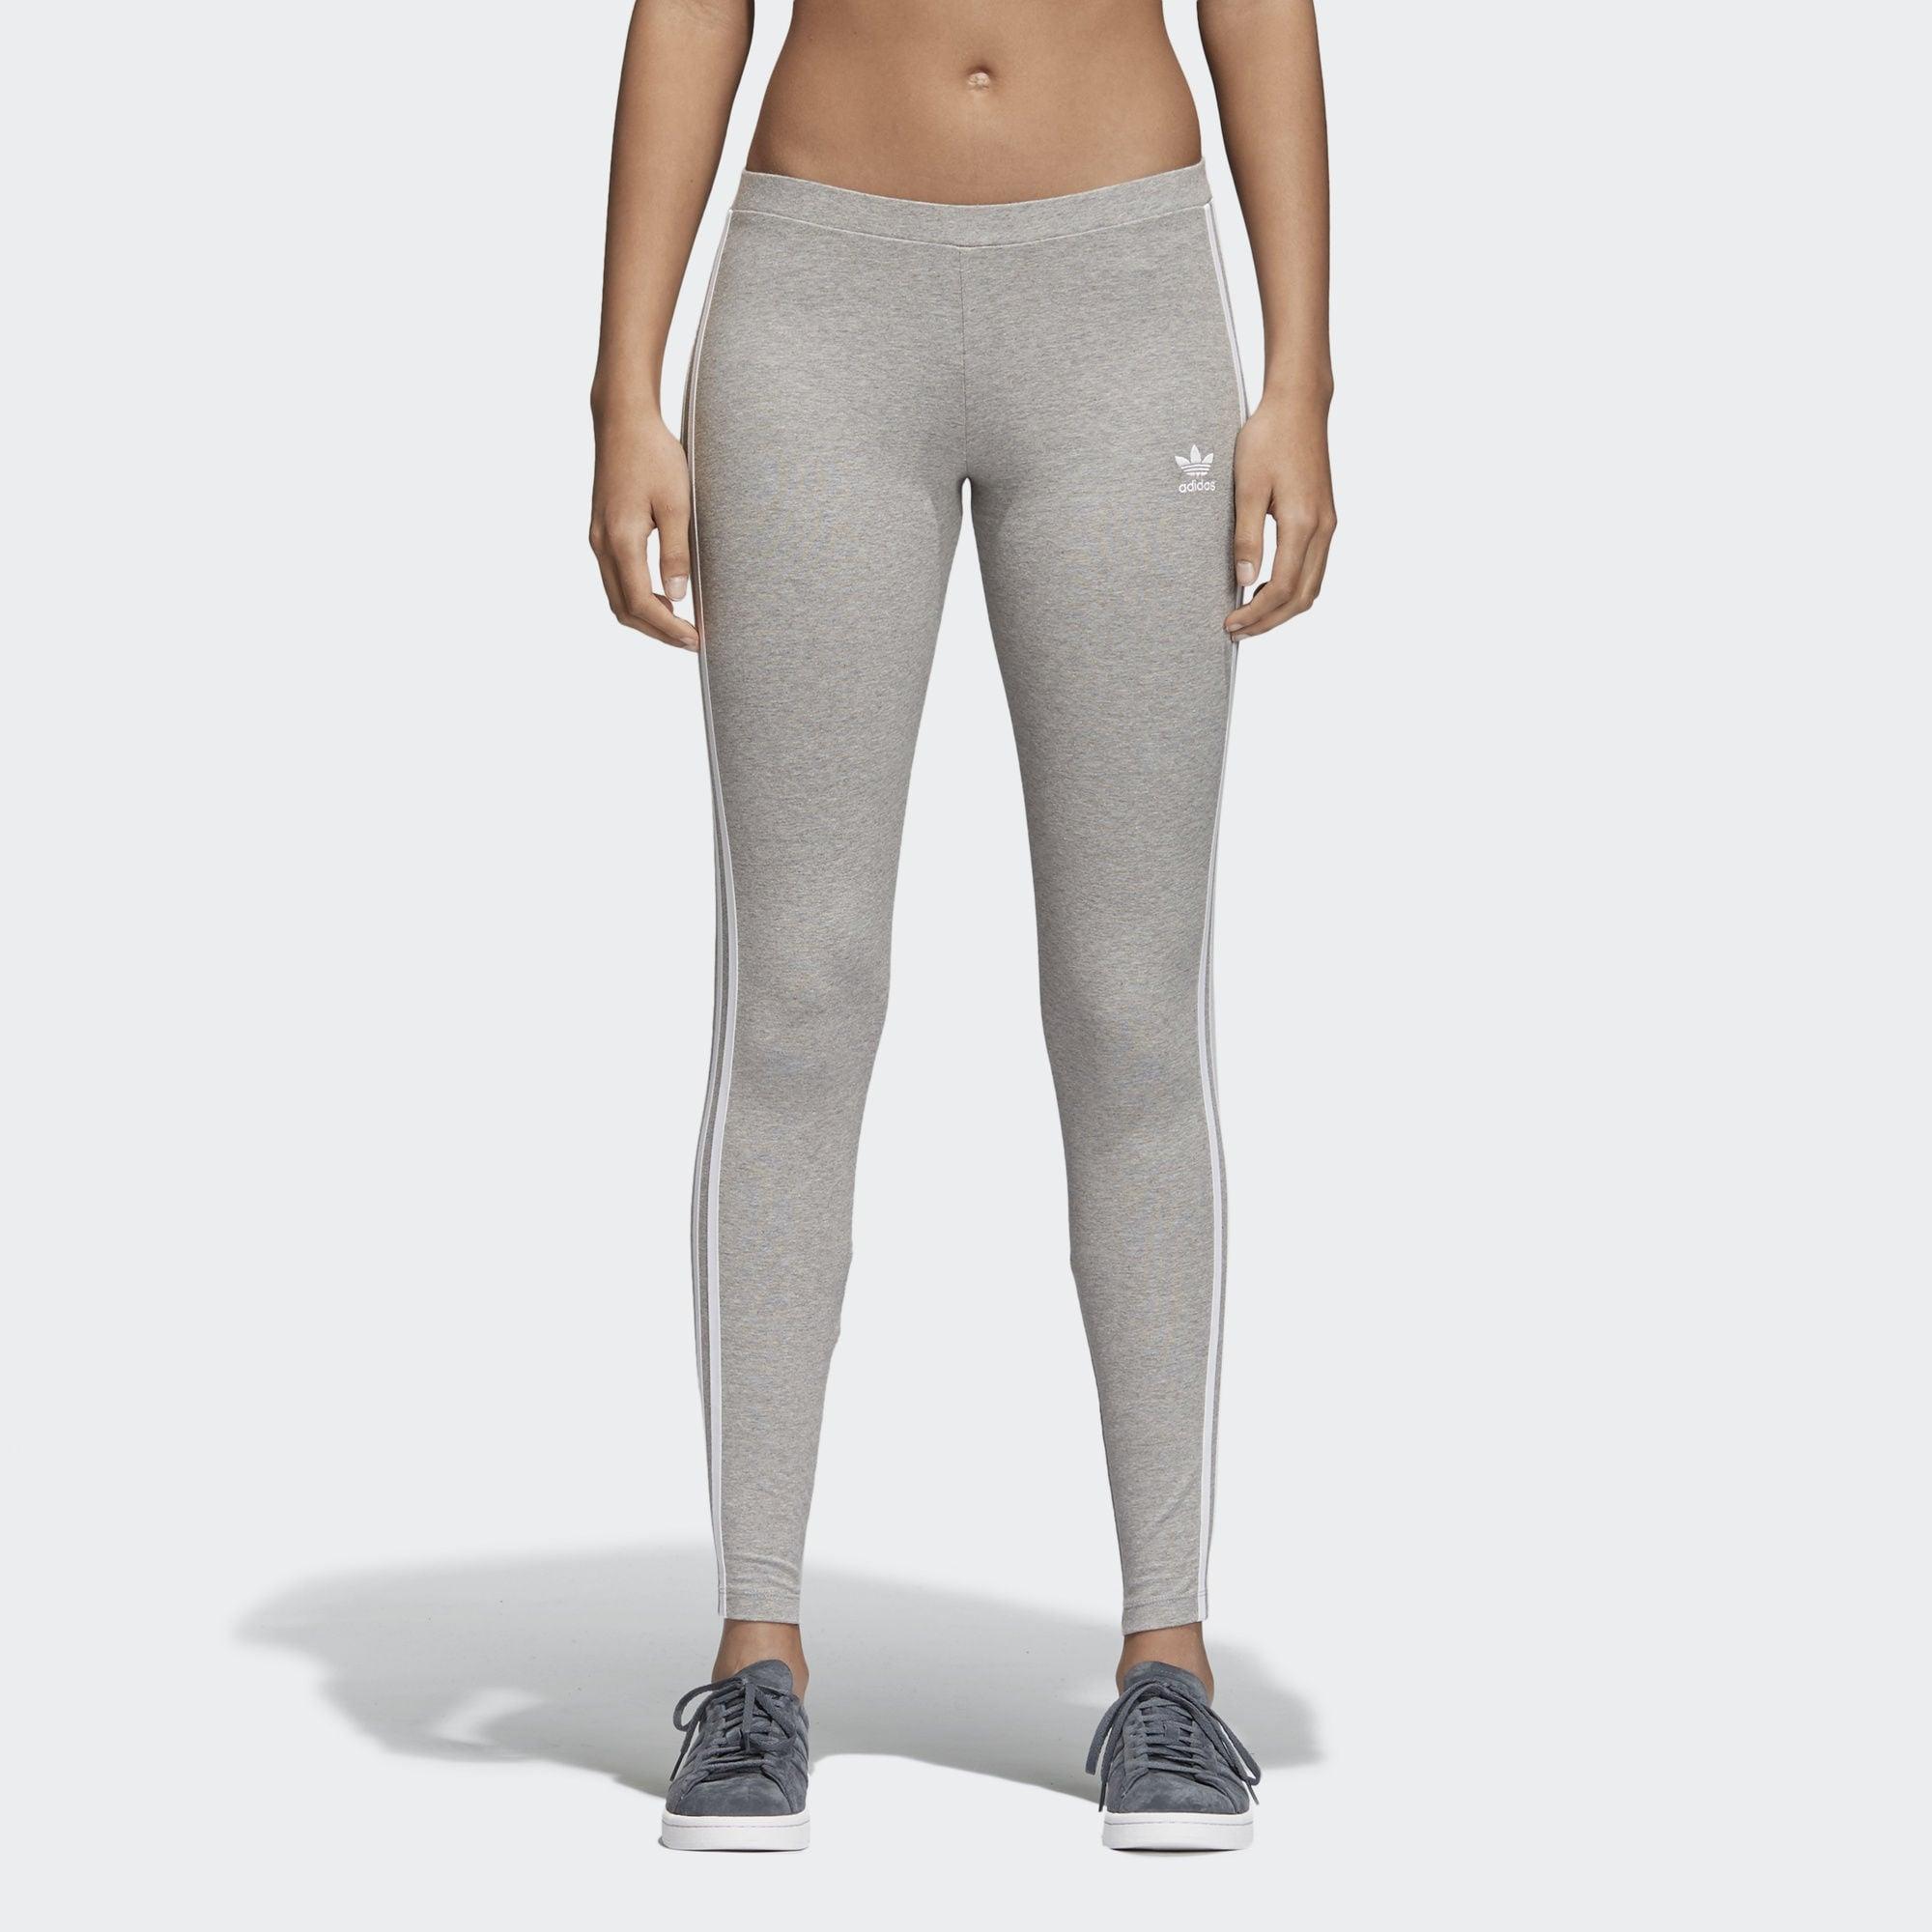 Adidas Originals Tights Stripe Womens Grey 3 19420 Stripe Tights ec1cee0 - accademiadellescienzedellumbria.xyz